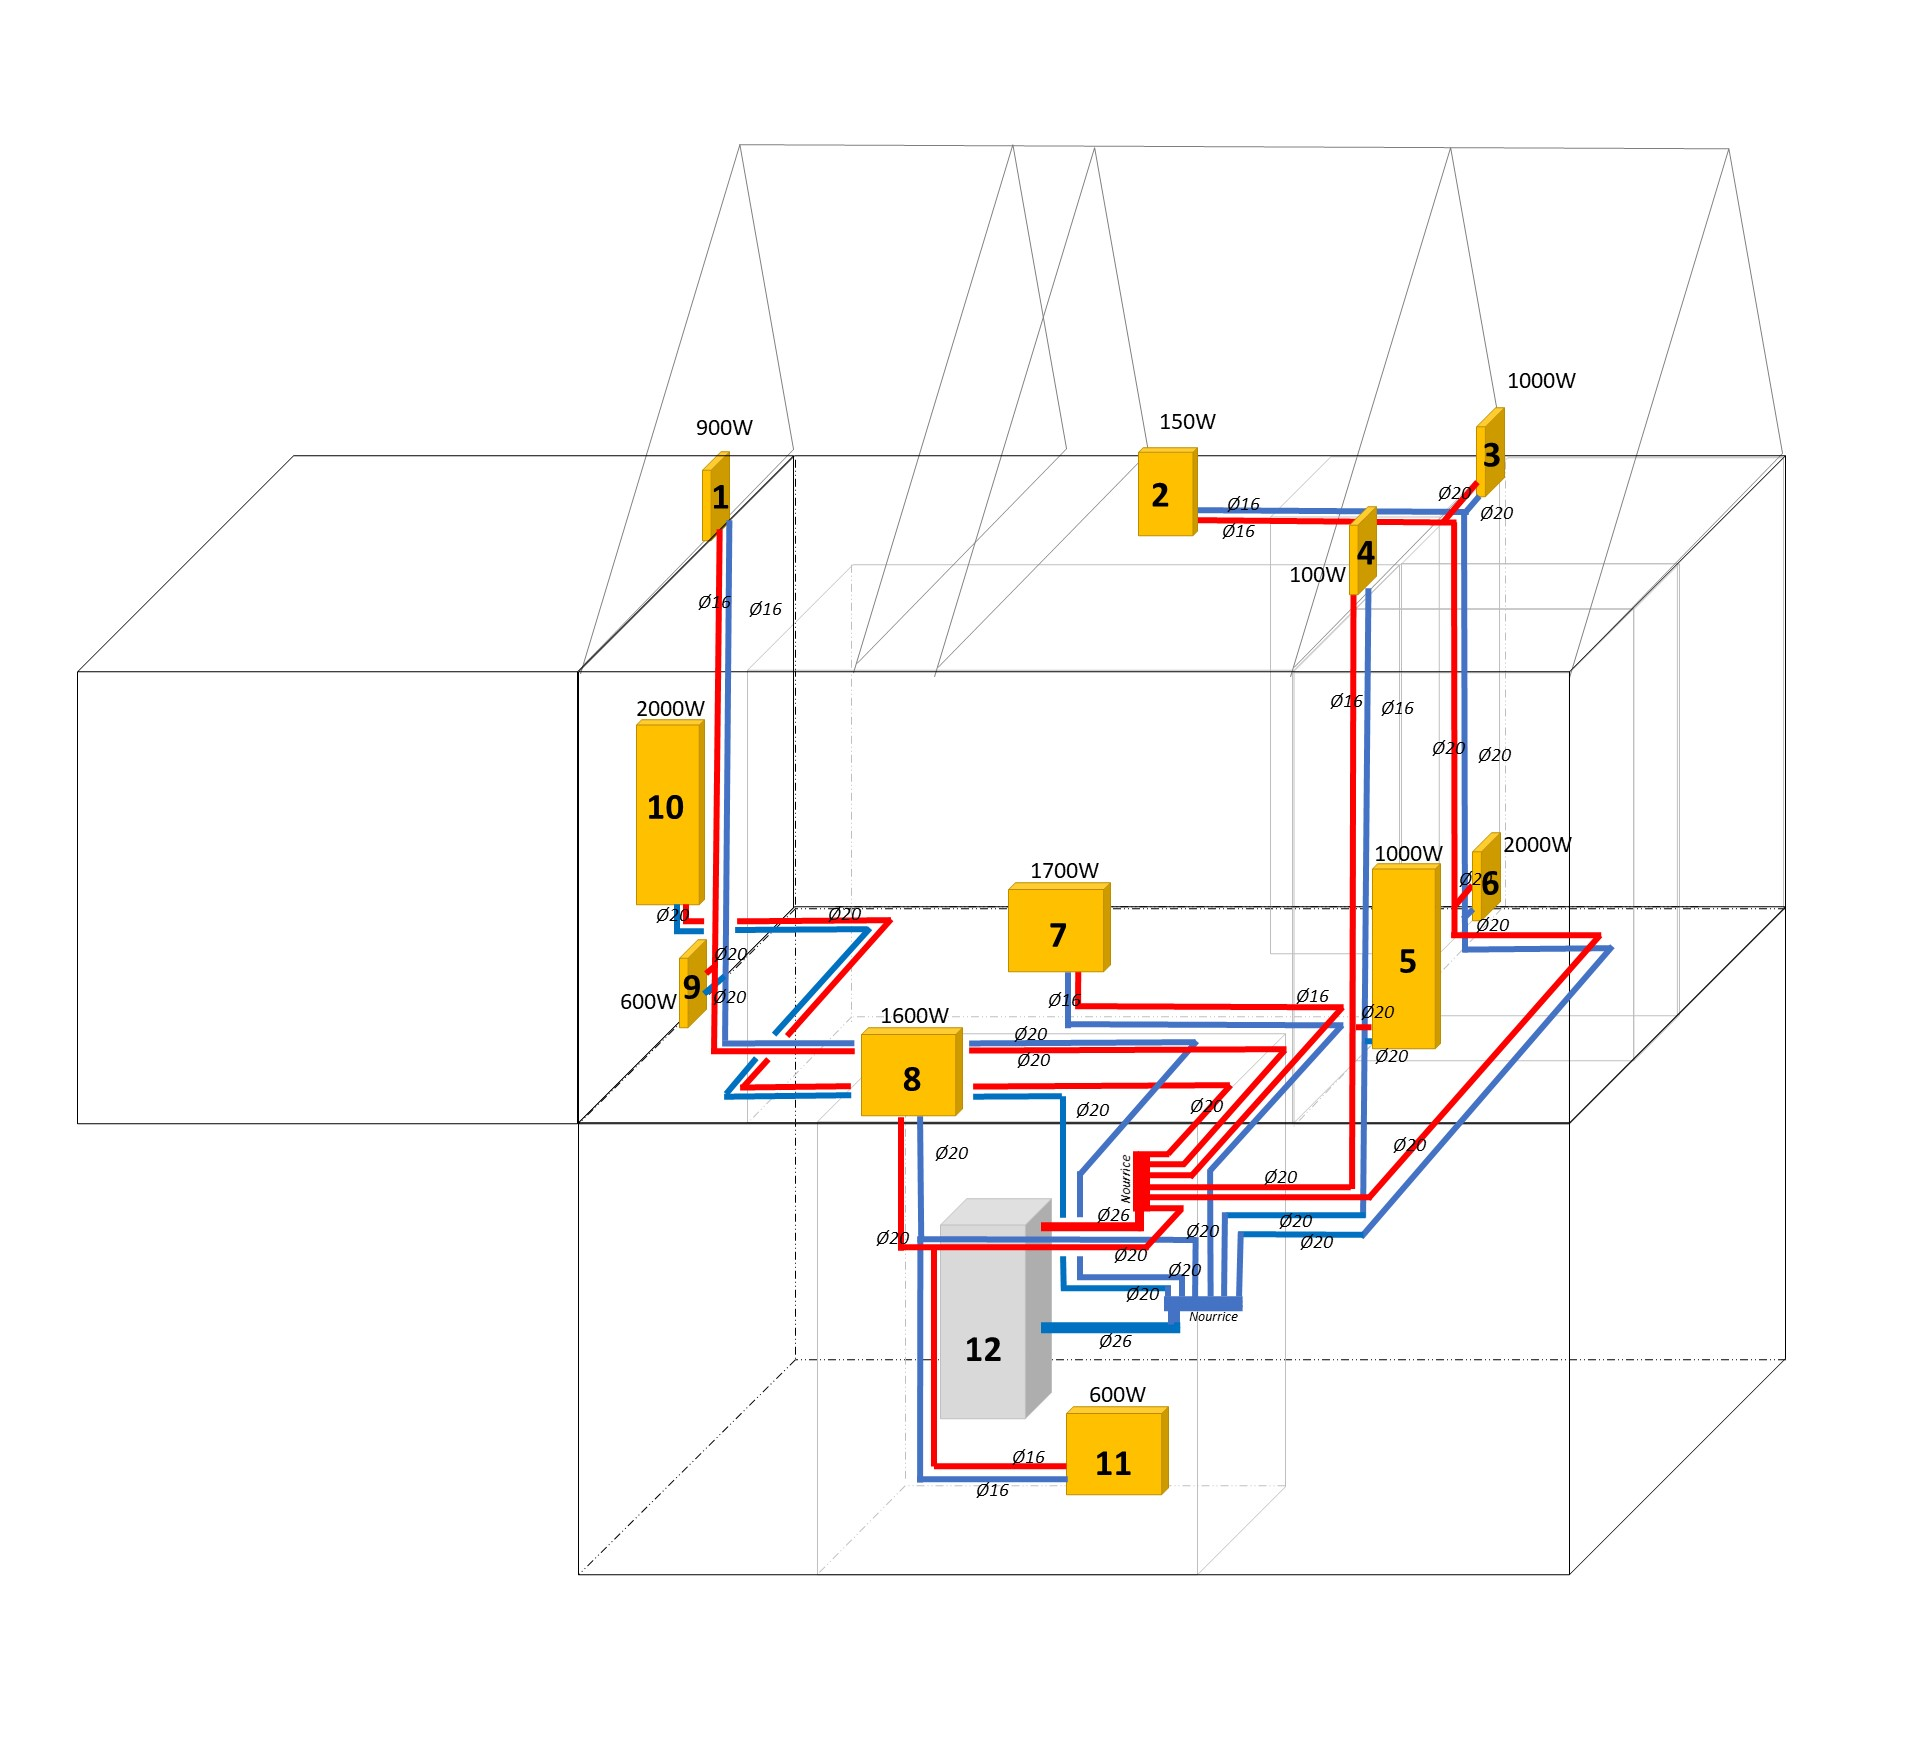 réseau chauffage.jpg, 266.4 kb, 1923 x 1739